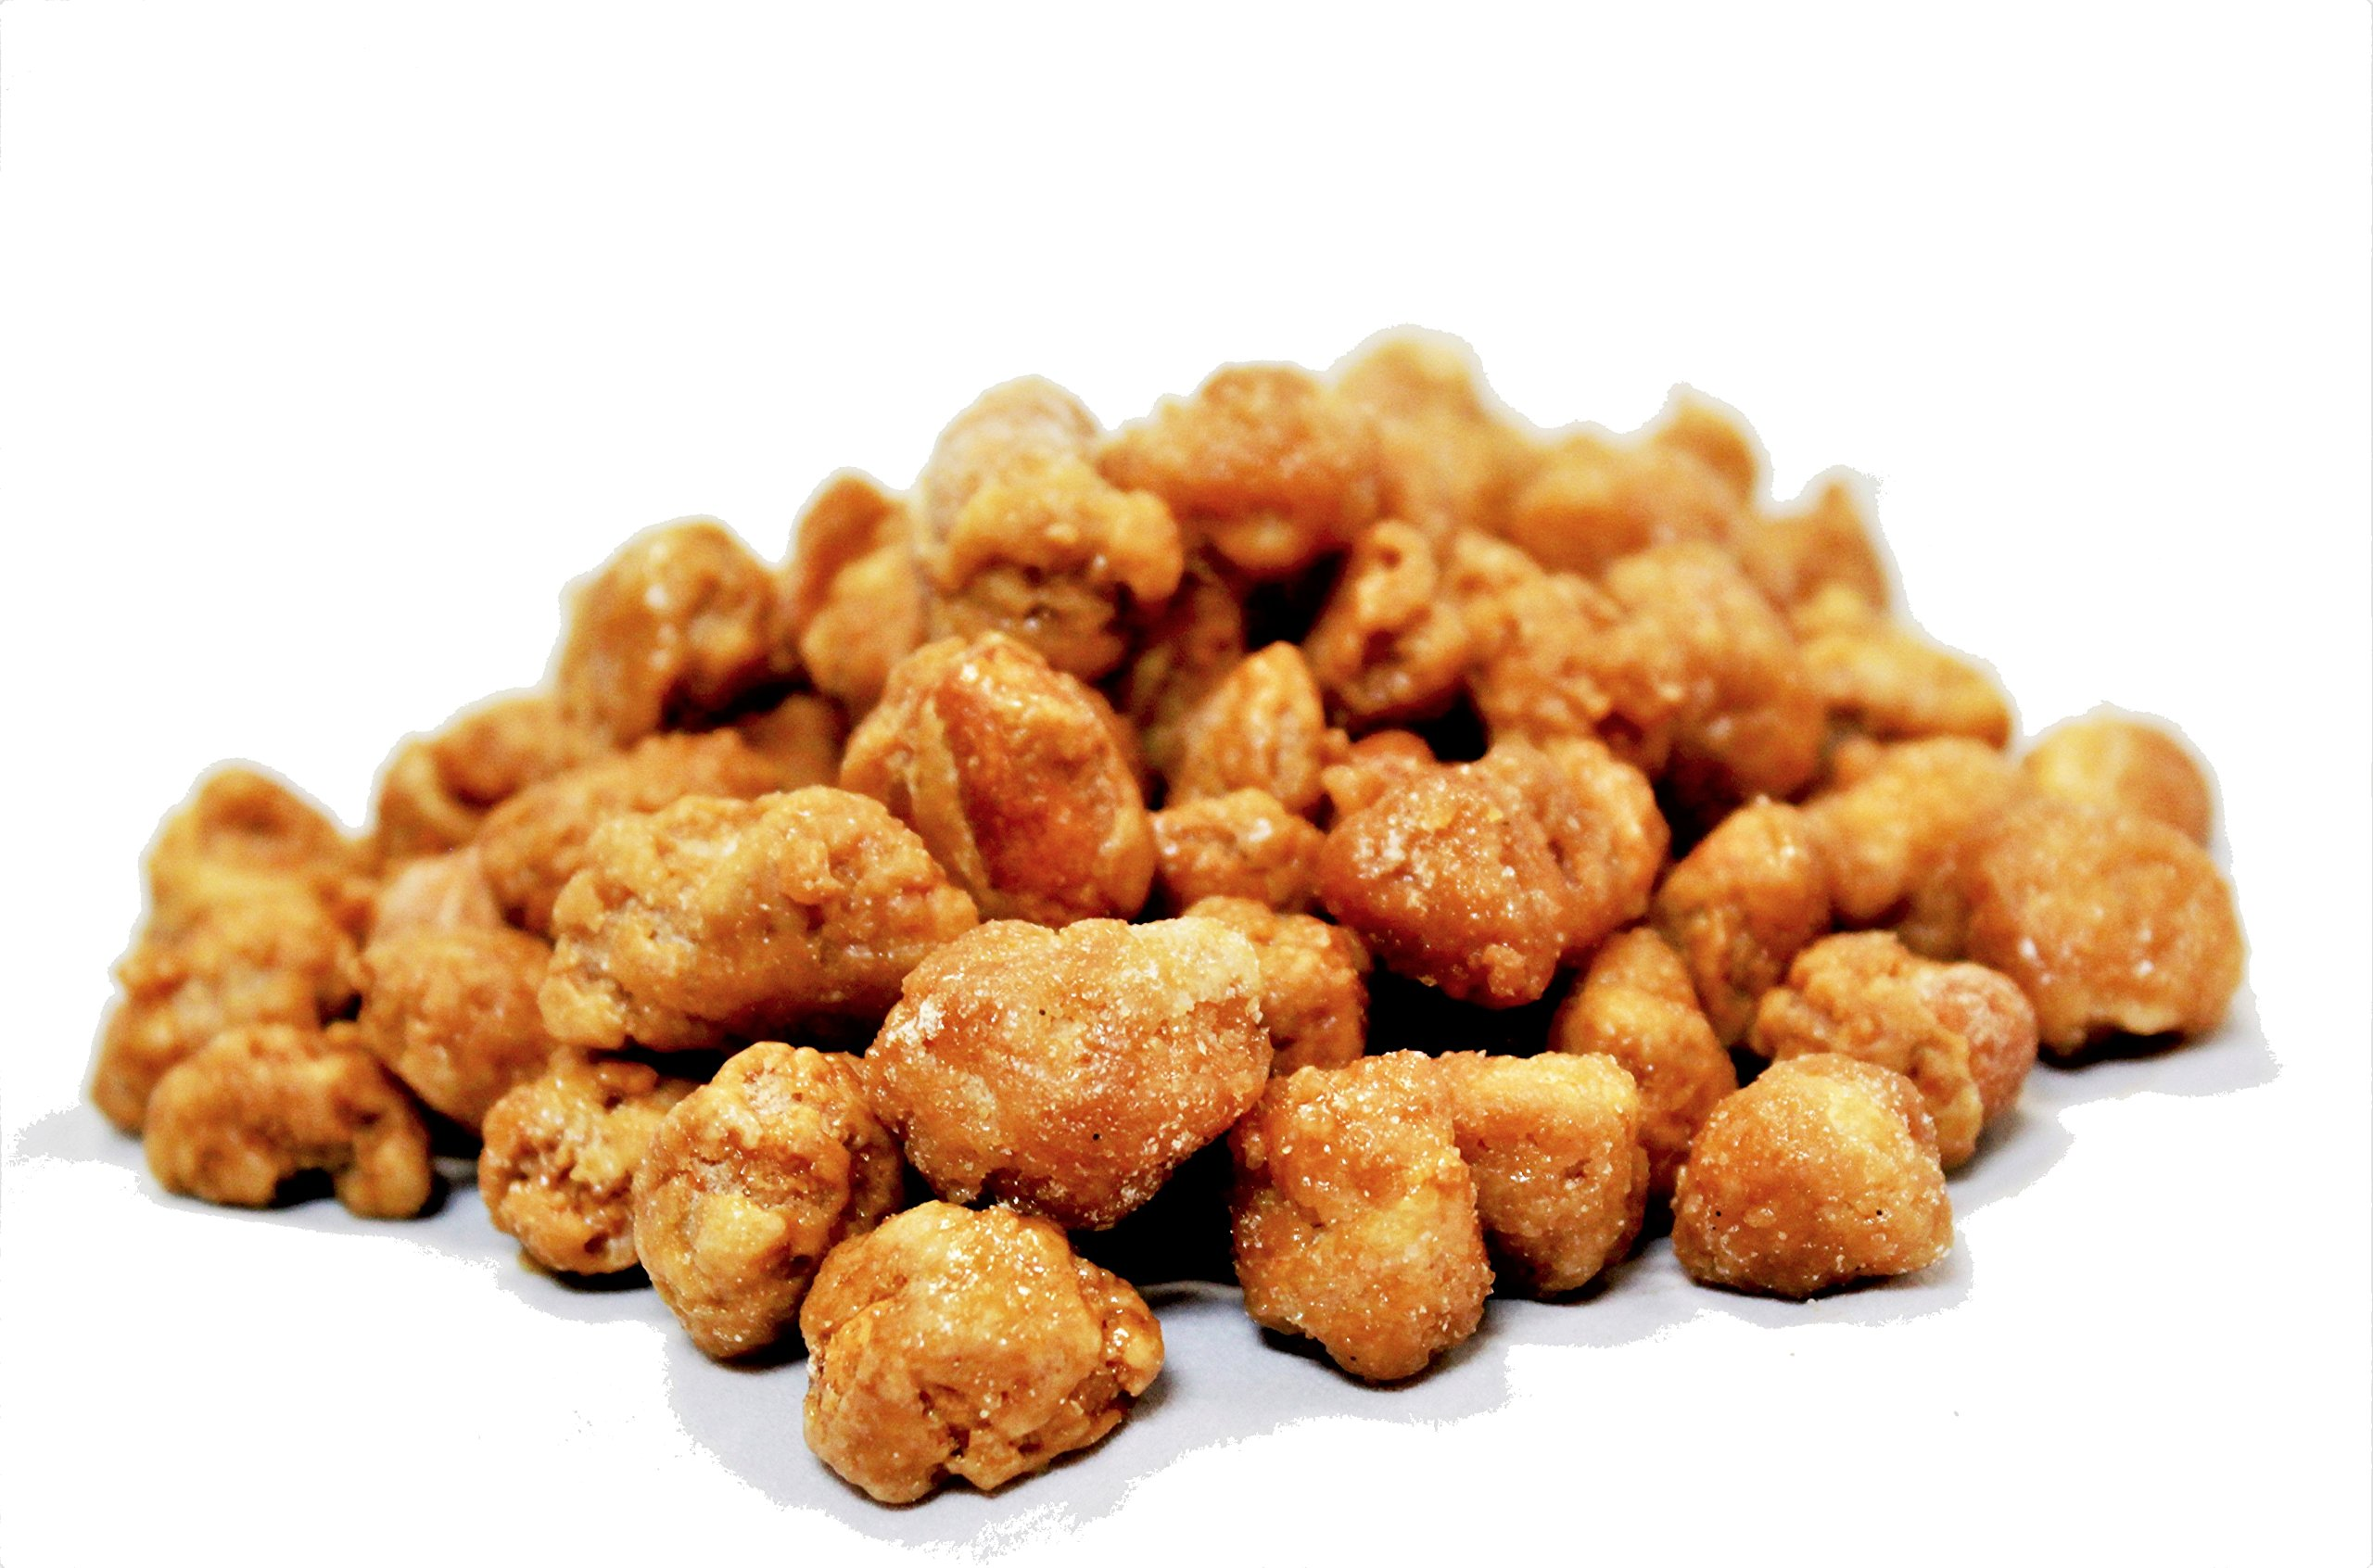 Its Delish Toffee Peanuts Chili 5 lb Bulk by Its Delish